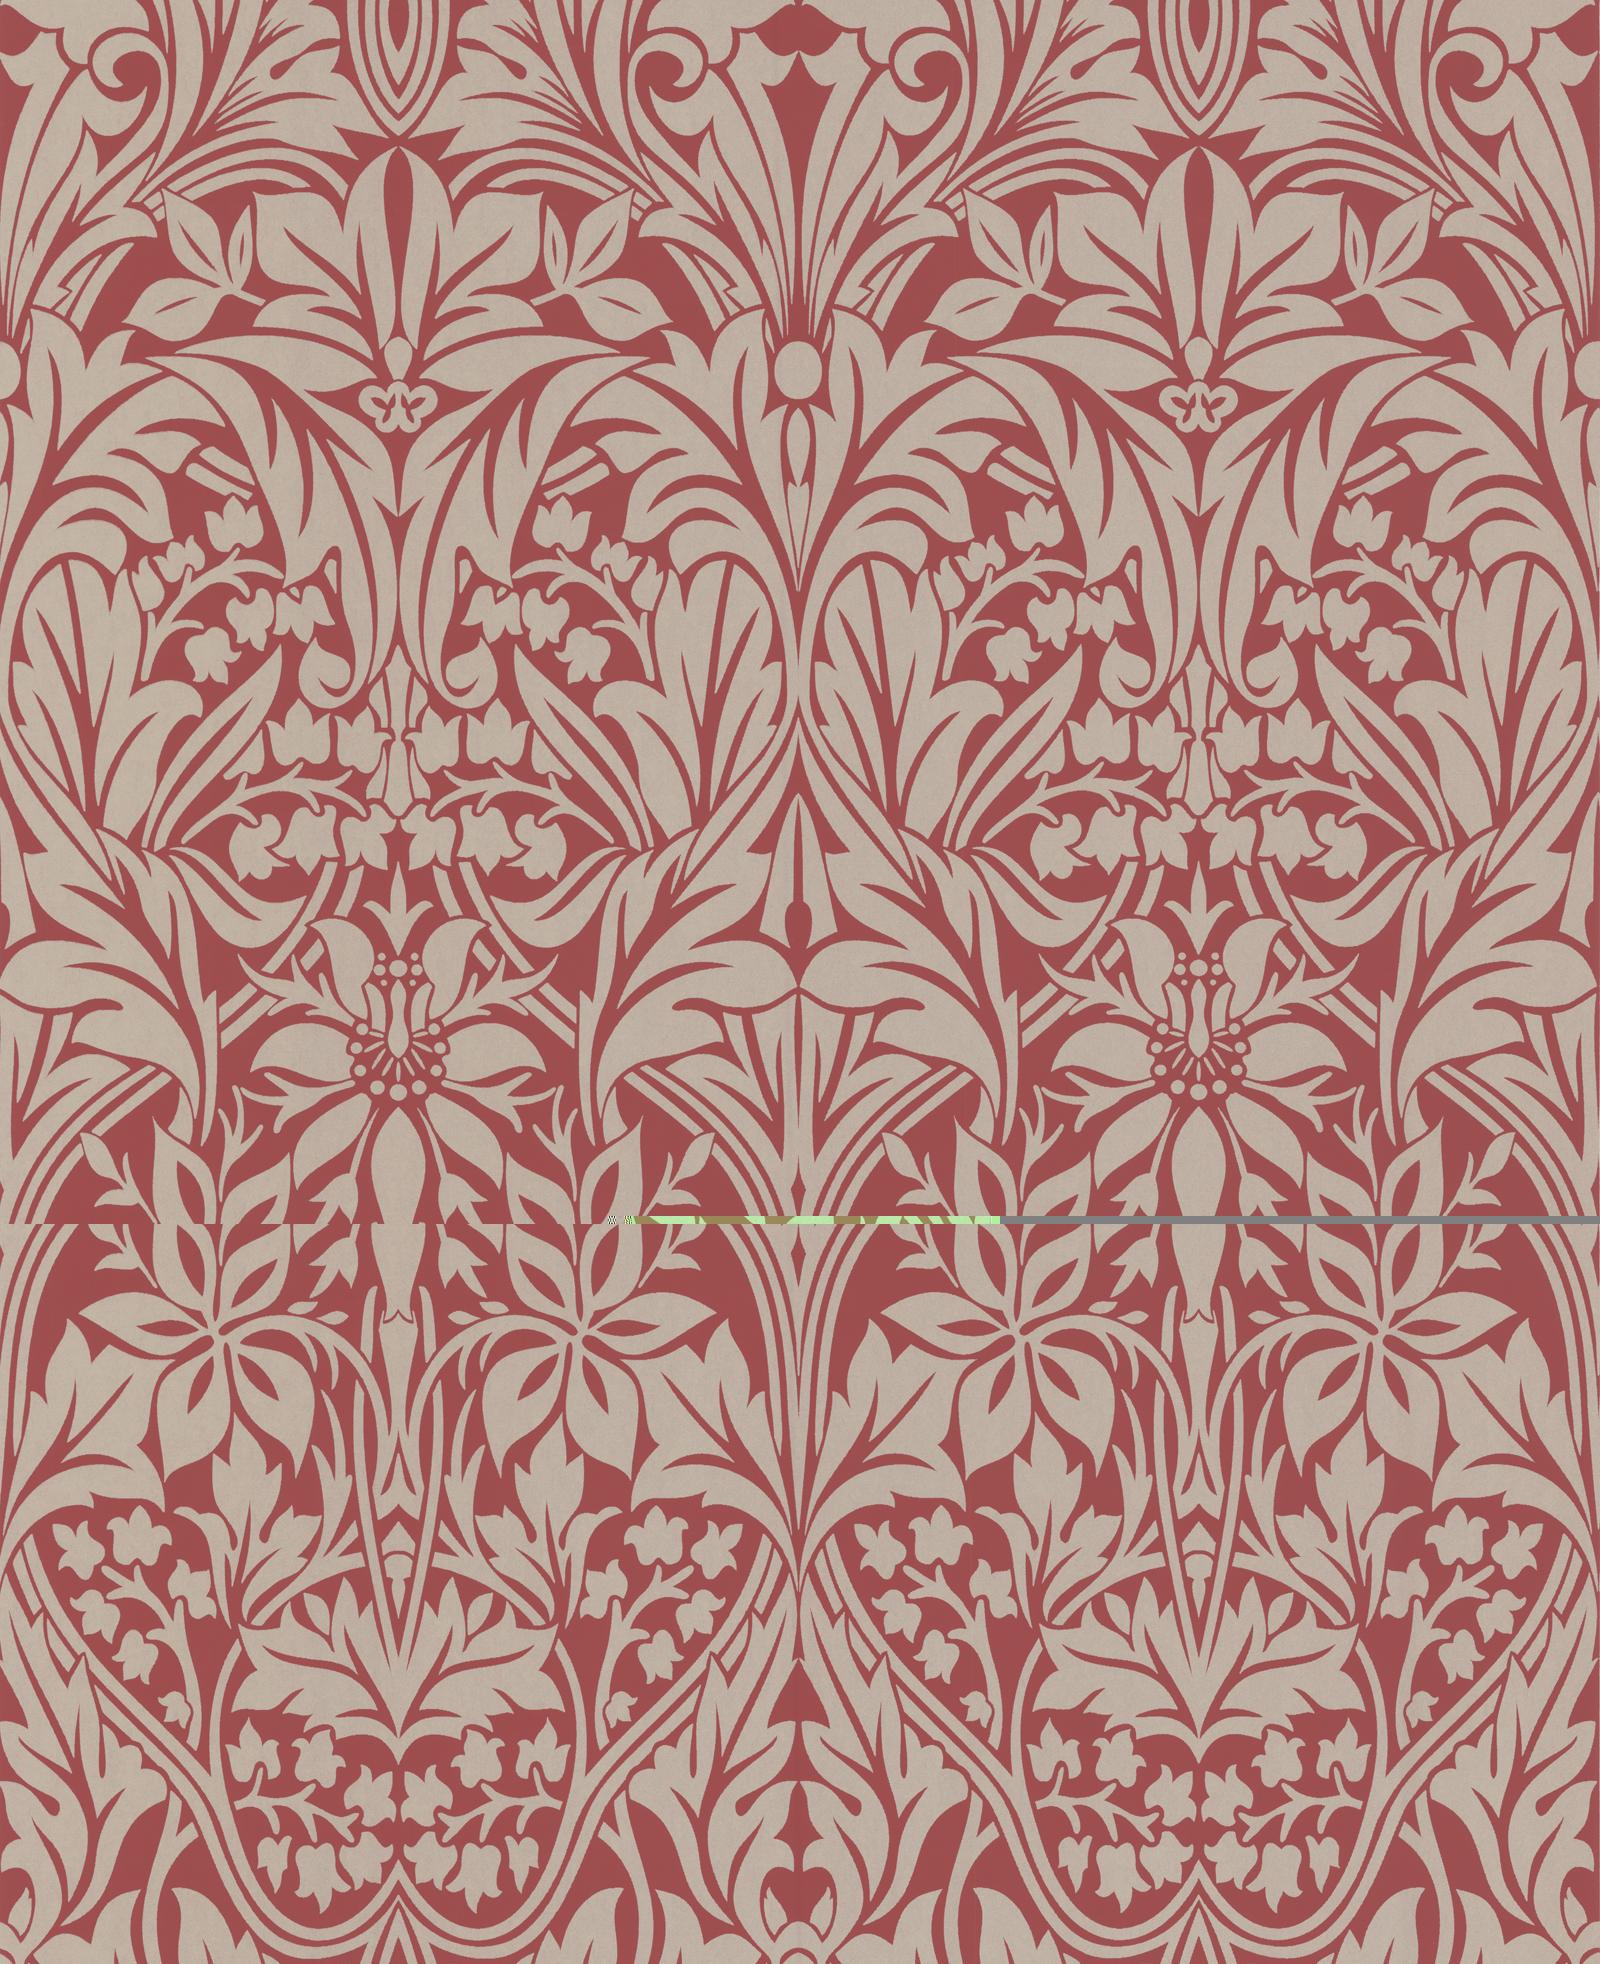 Historic art nouveau wallpaper wallpapersafari for Pattern wallpaper for home